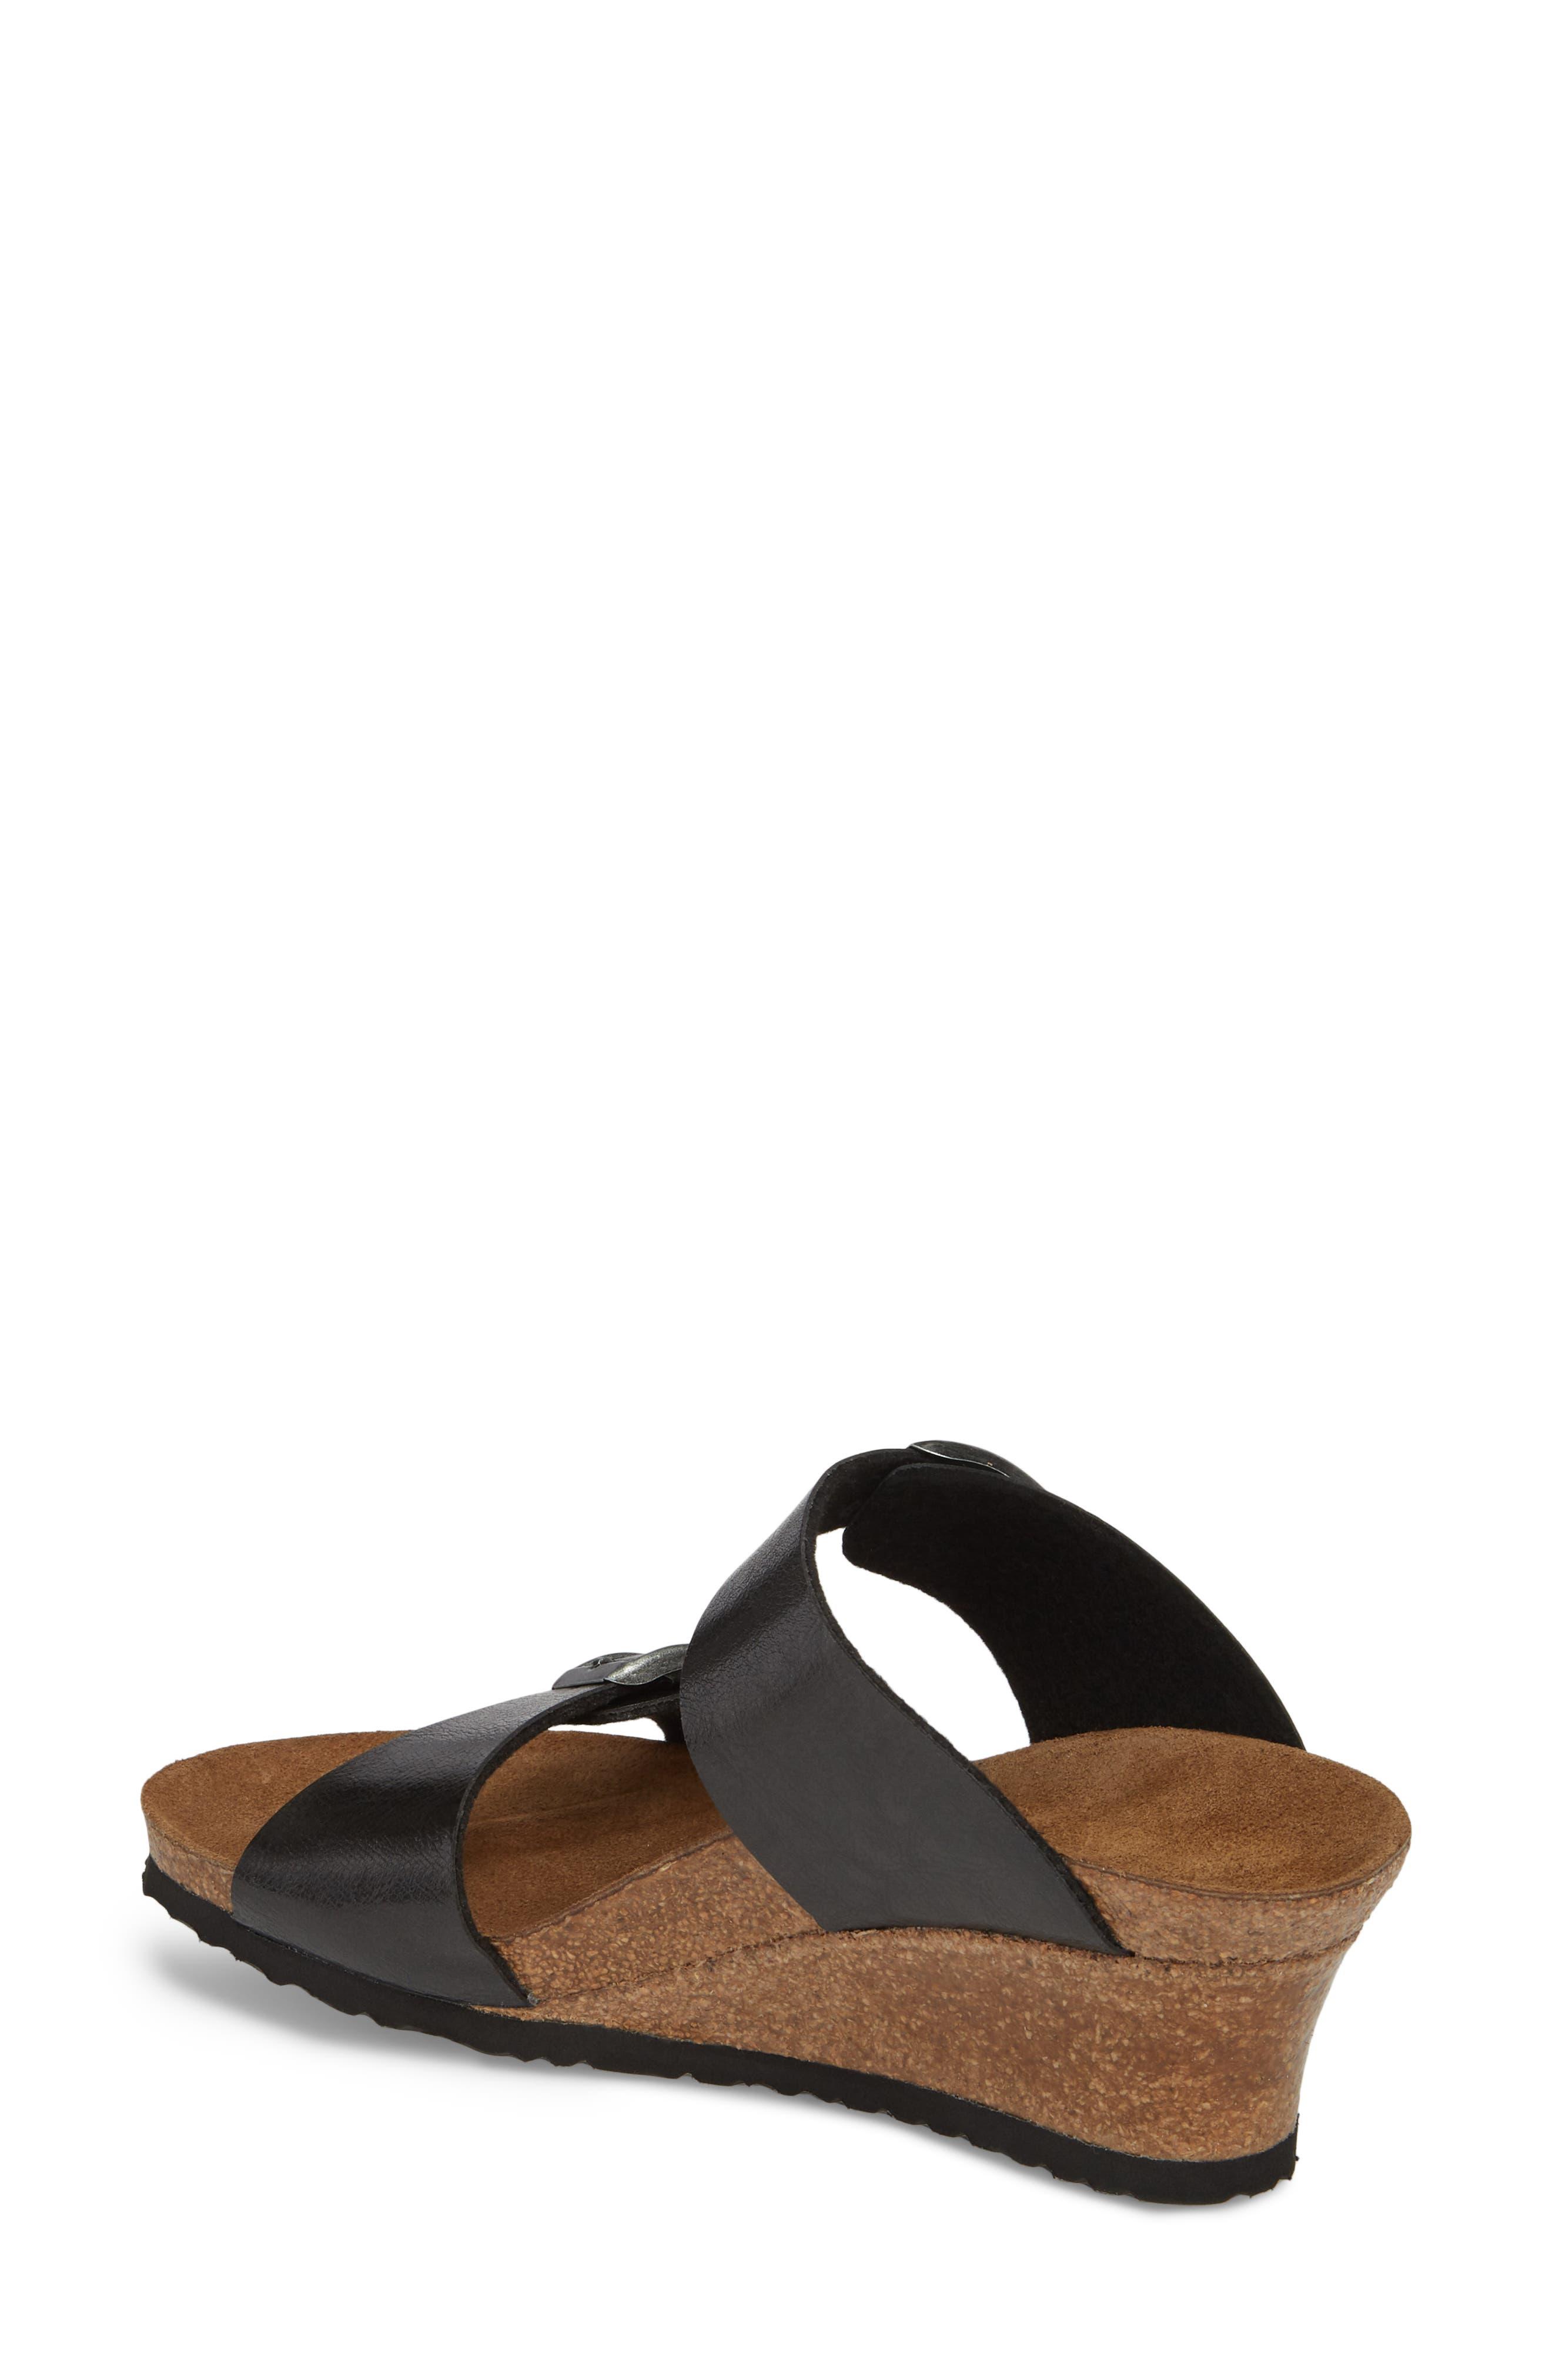 Papillio by Birkenstock Dorothy Wedge Slide Sandal,                             Alternate thumbnail 2, color,                             Graceful Licorice Leather